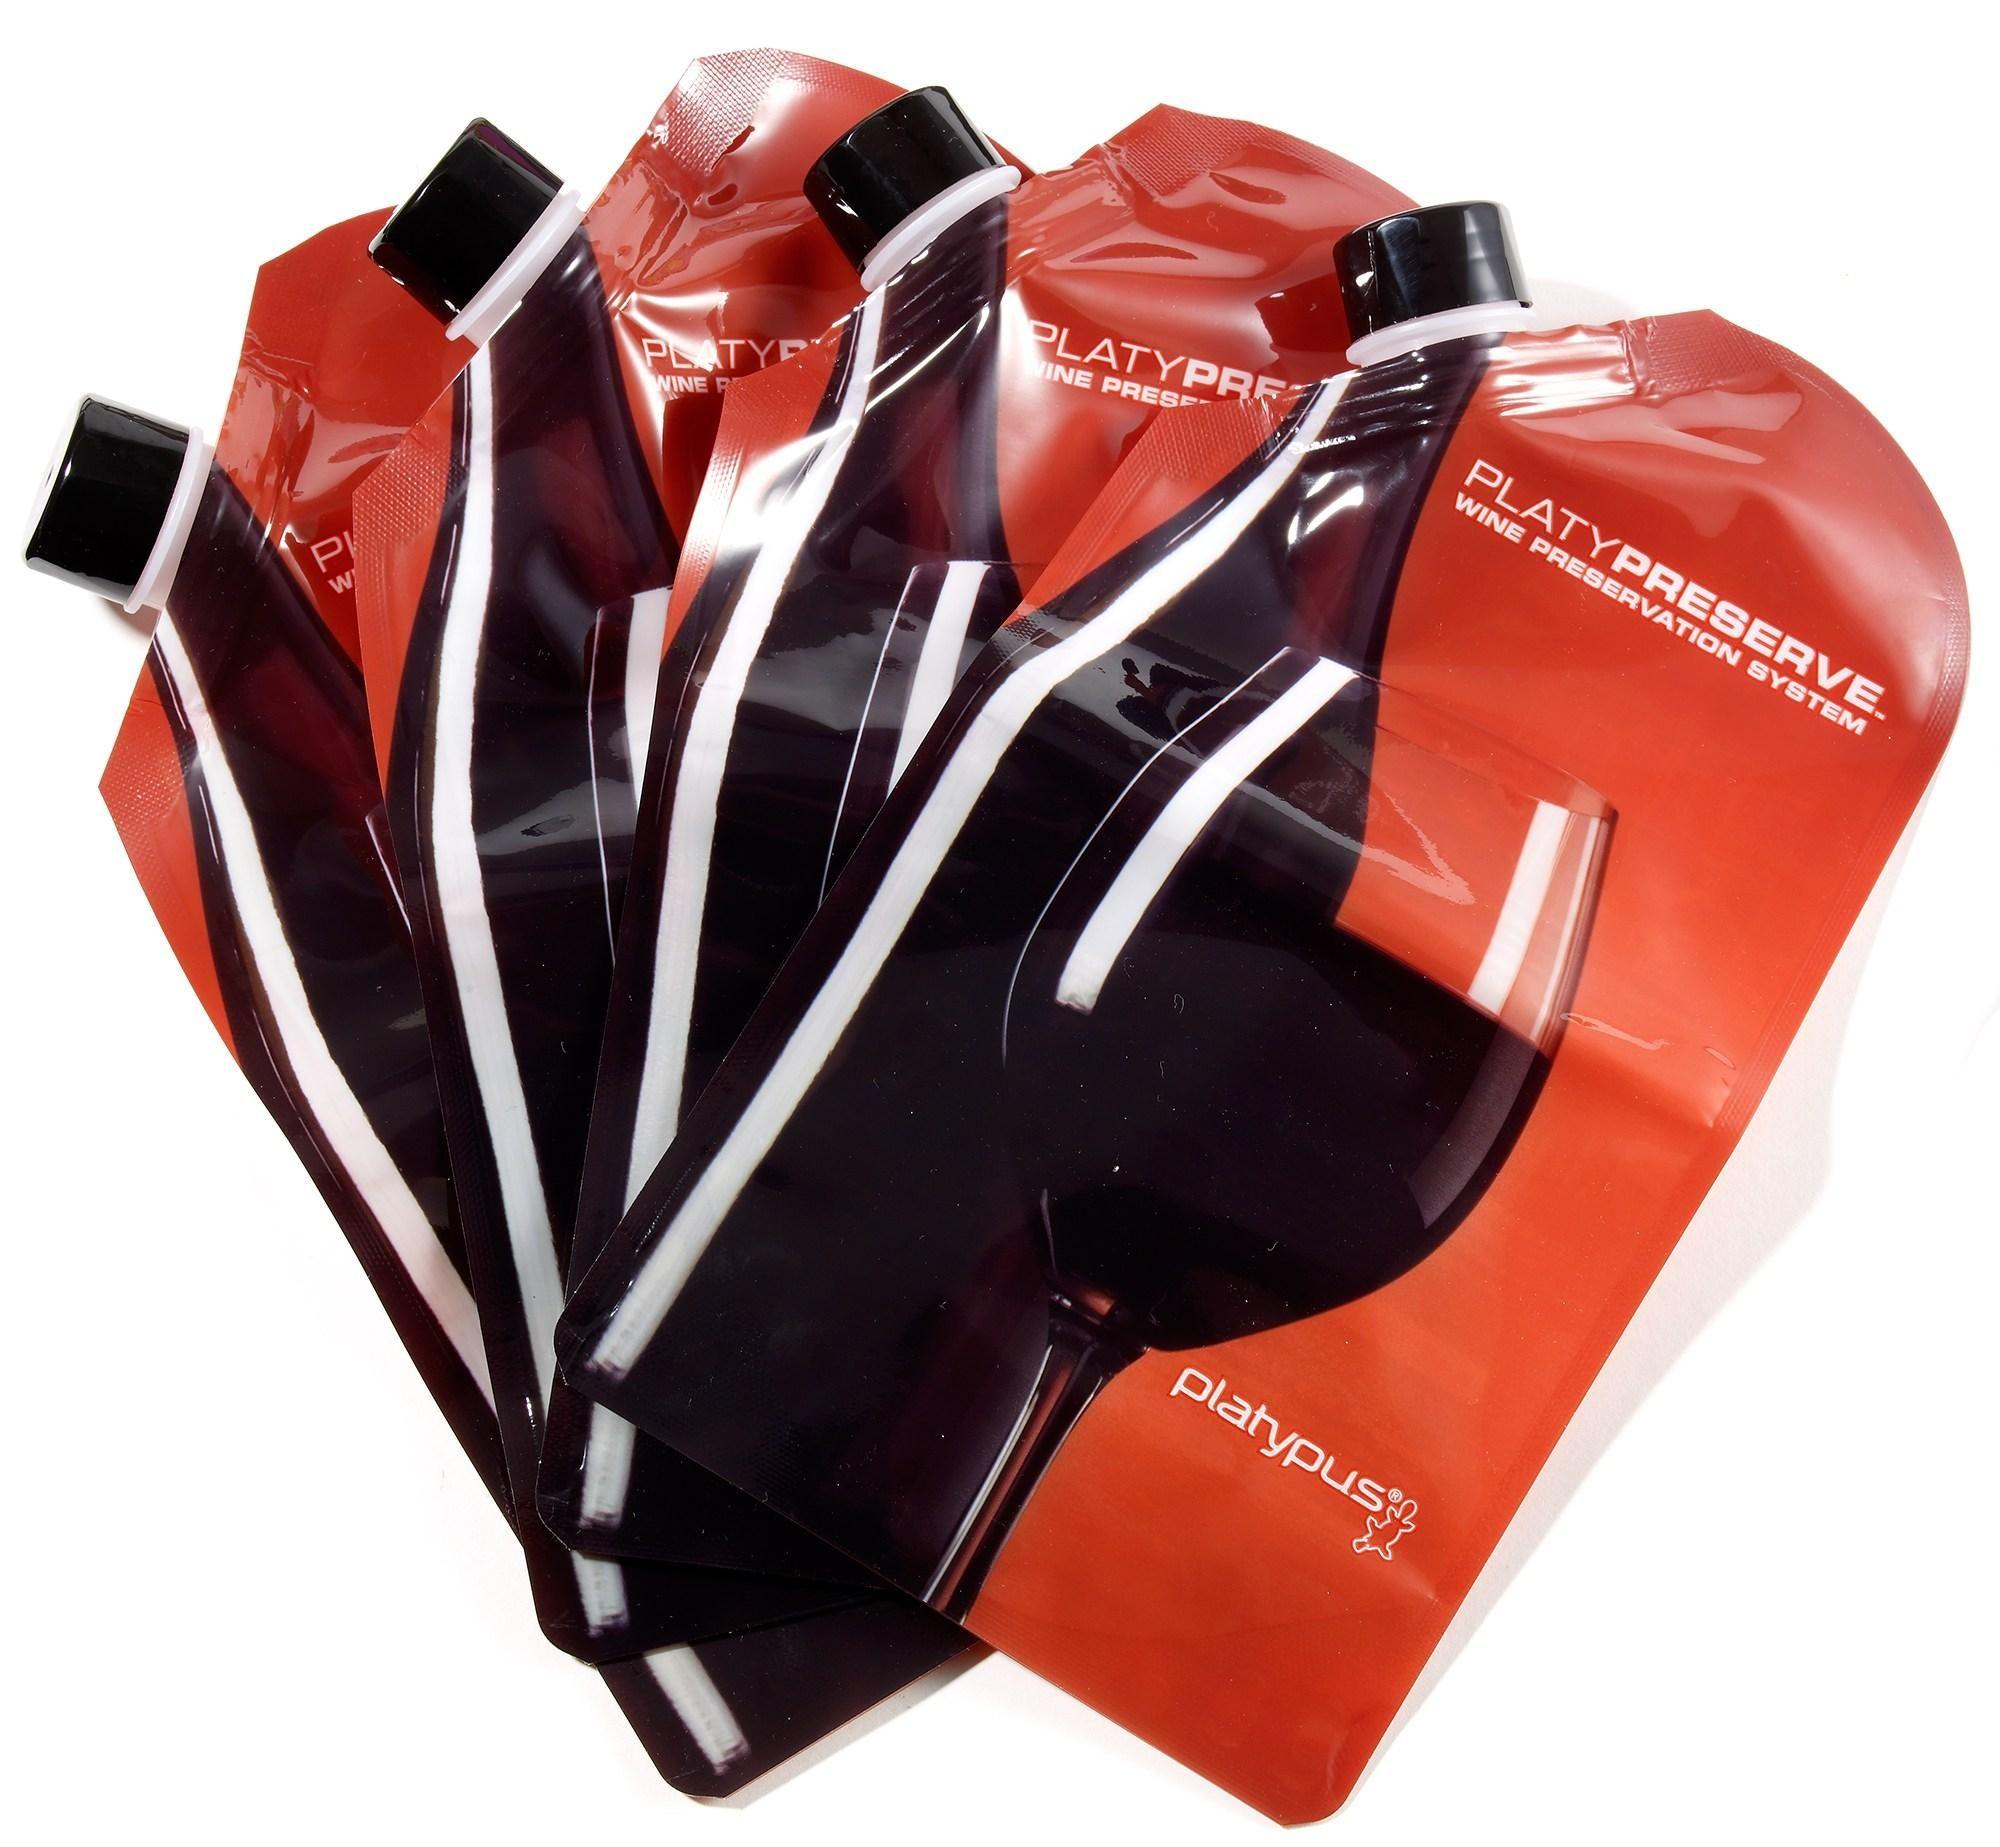 Platypus Platypreserve Wine Preservation System Package Of 4 Wine Preserver Wine Flask Wine